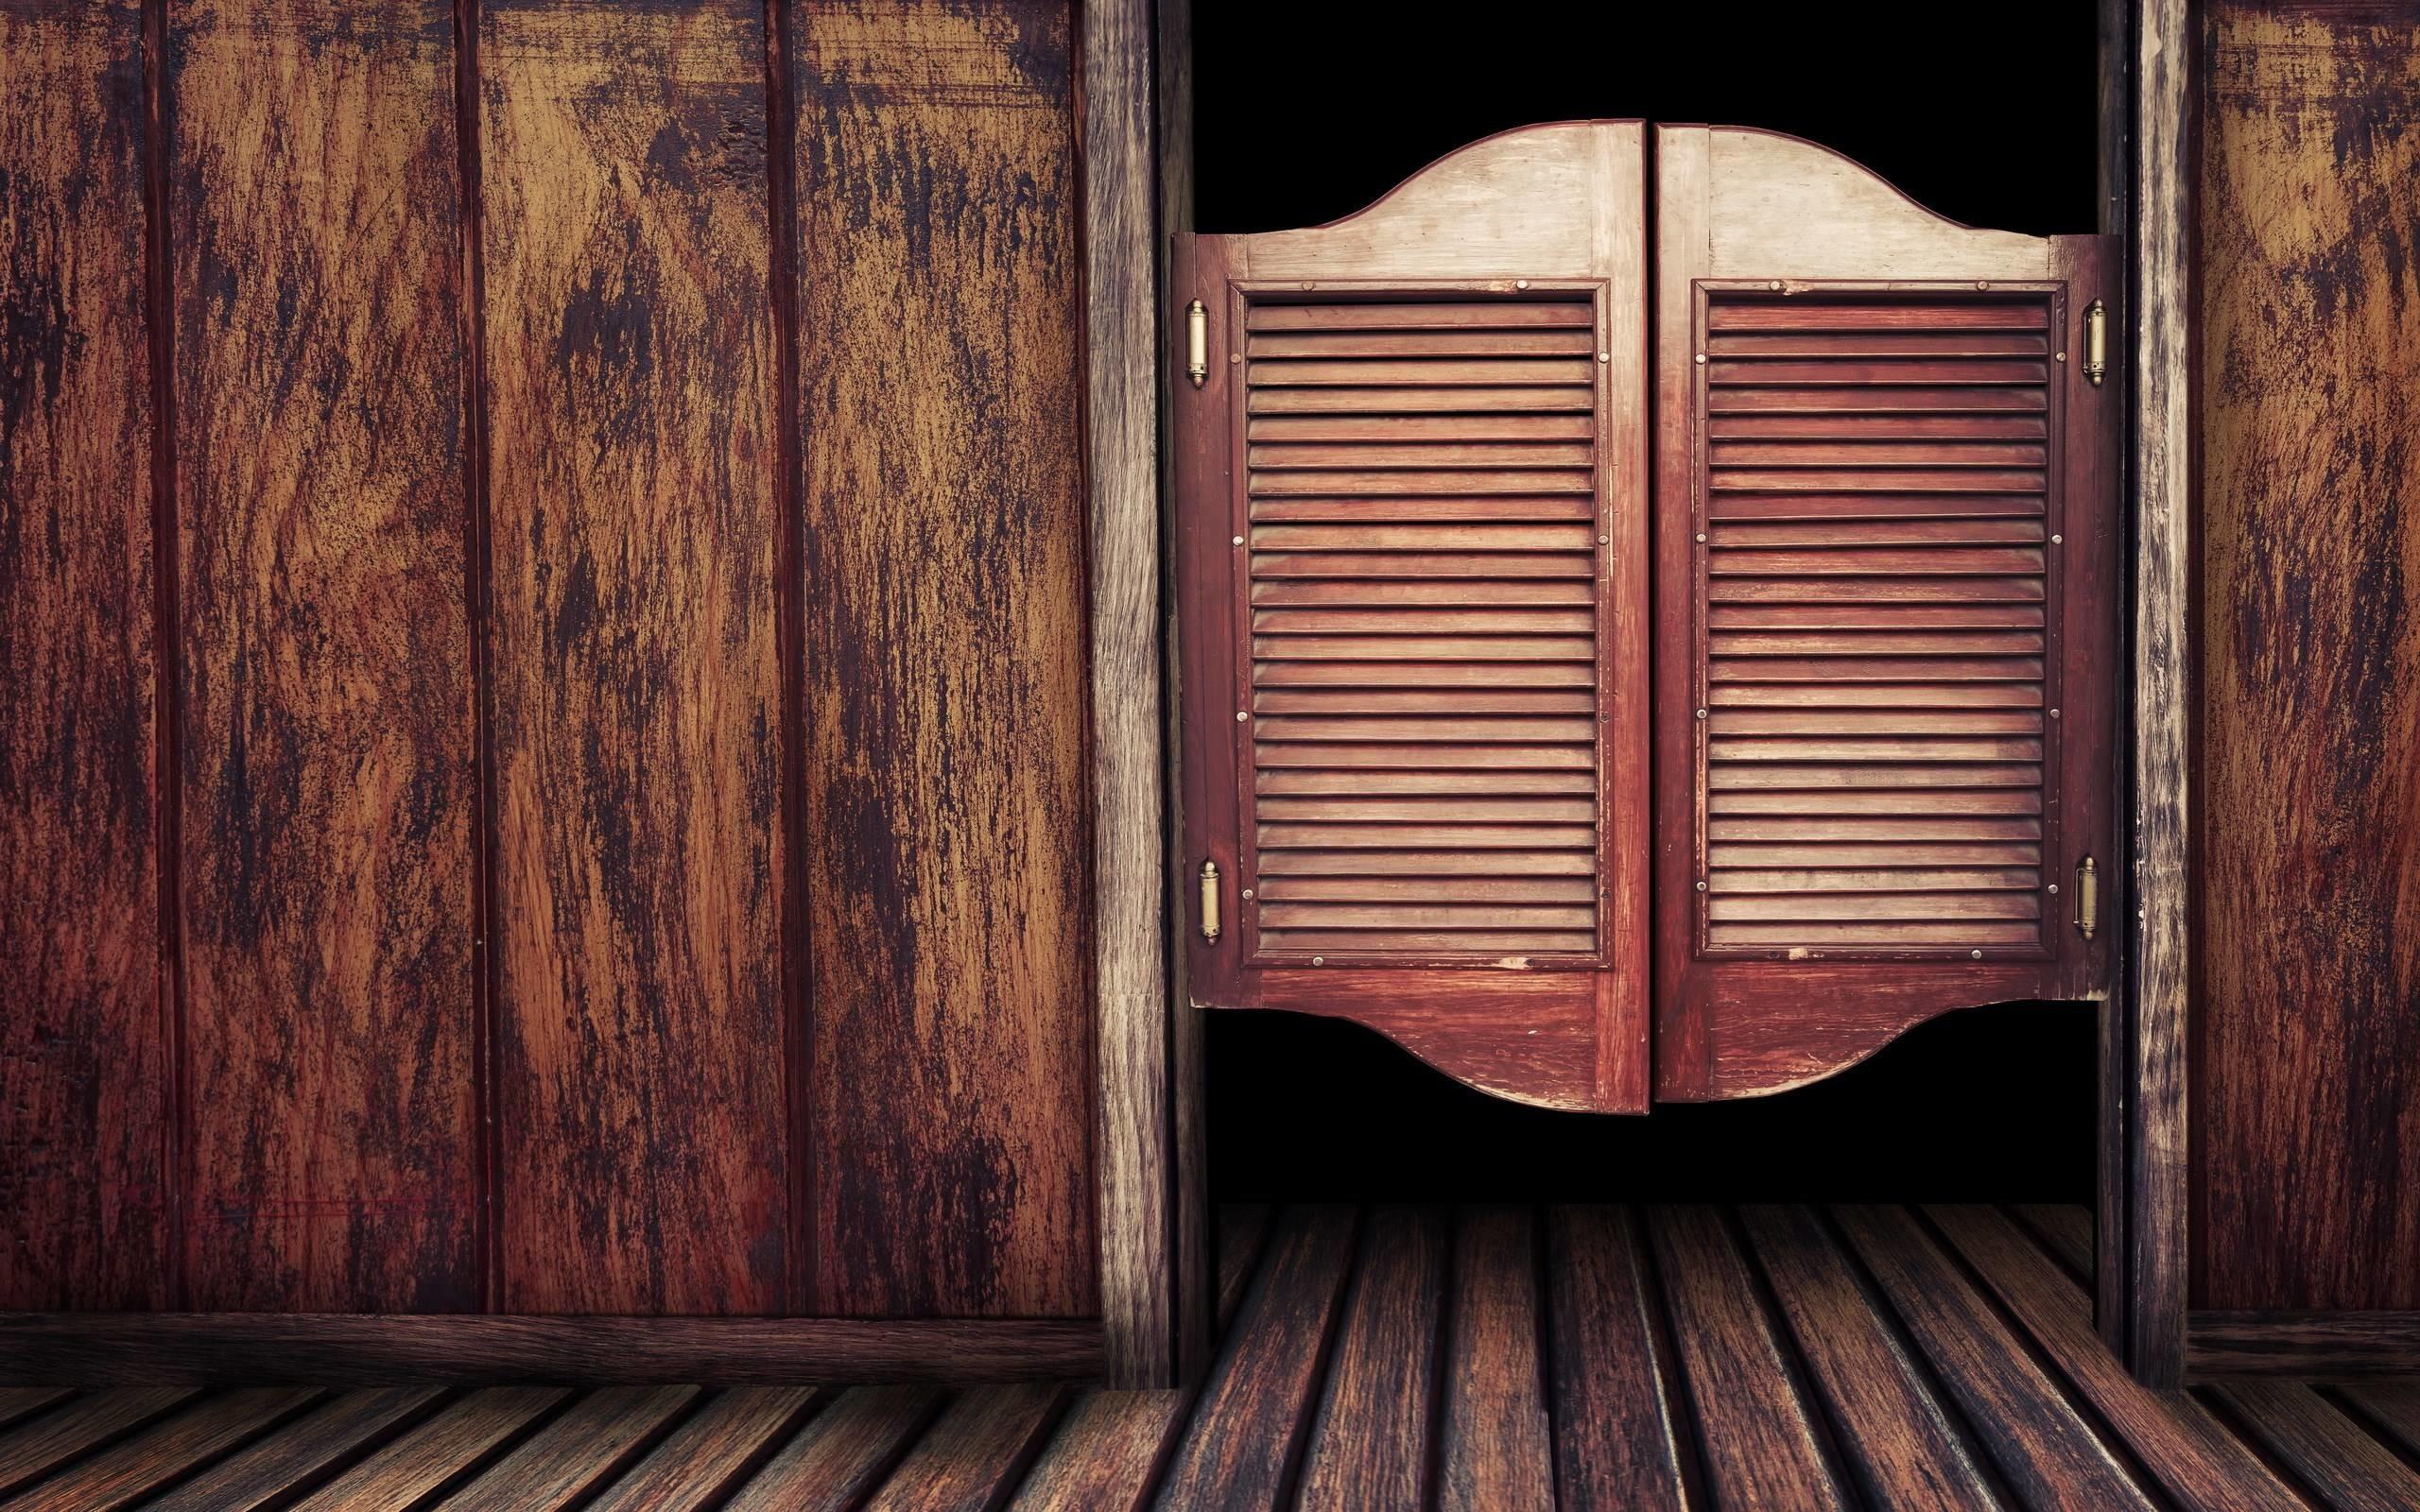 Bar Western Doors Wood HD Wallpaper – ZoomWalls